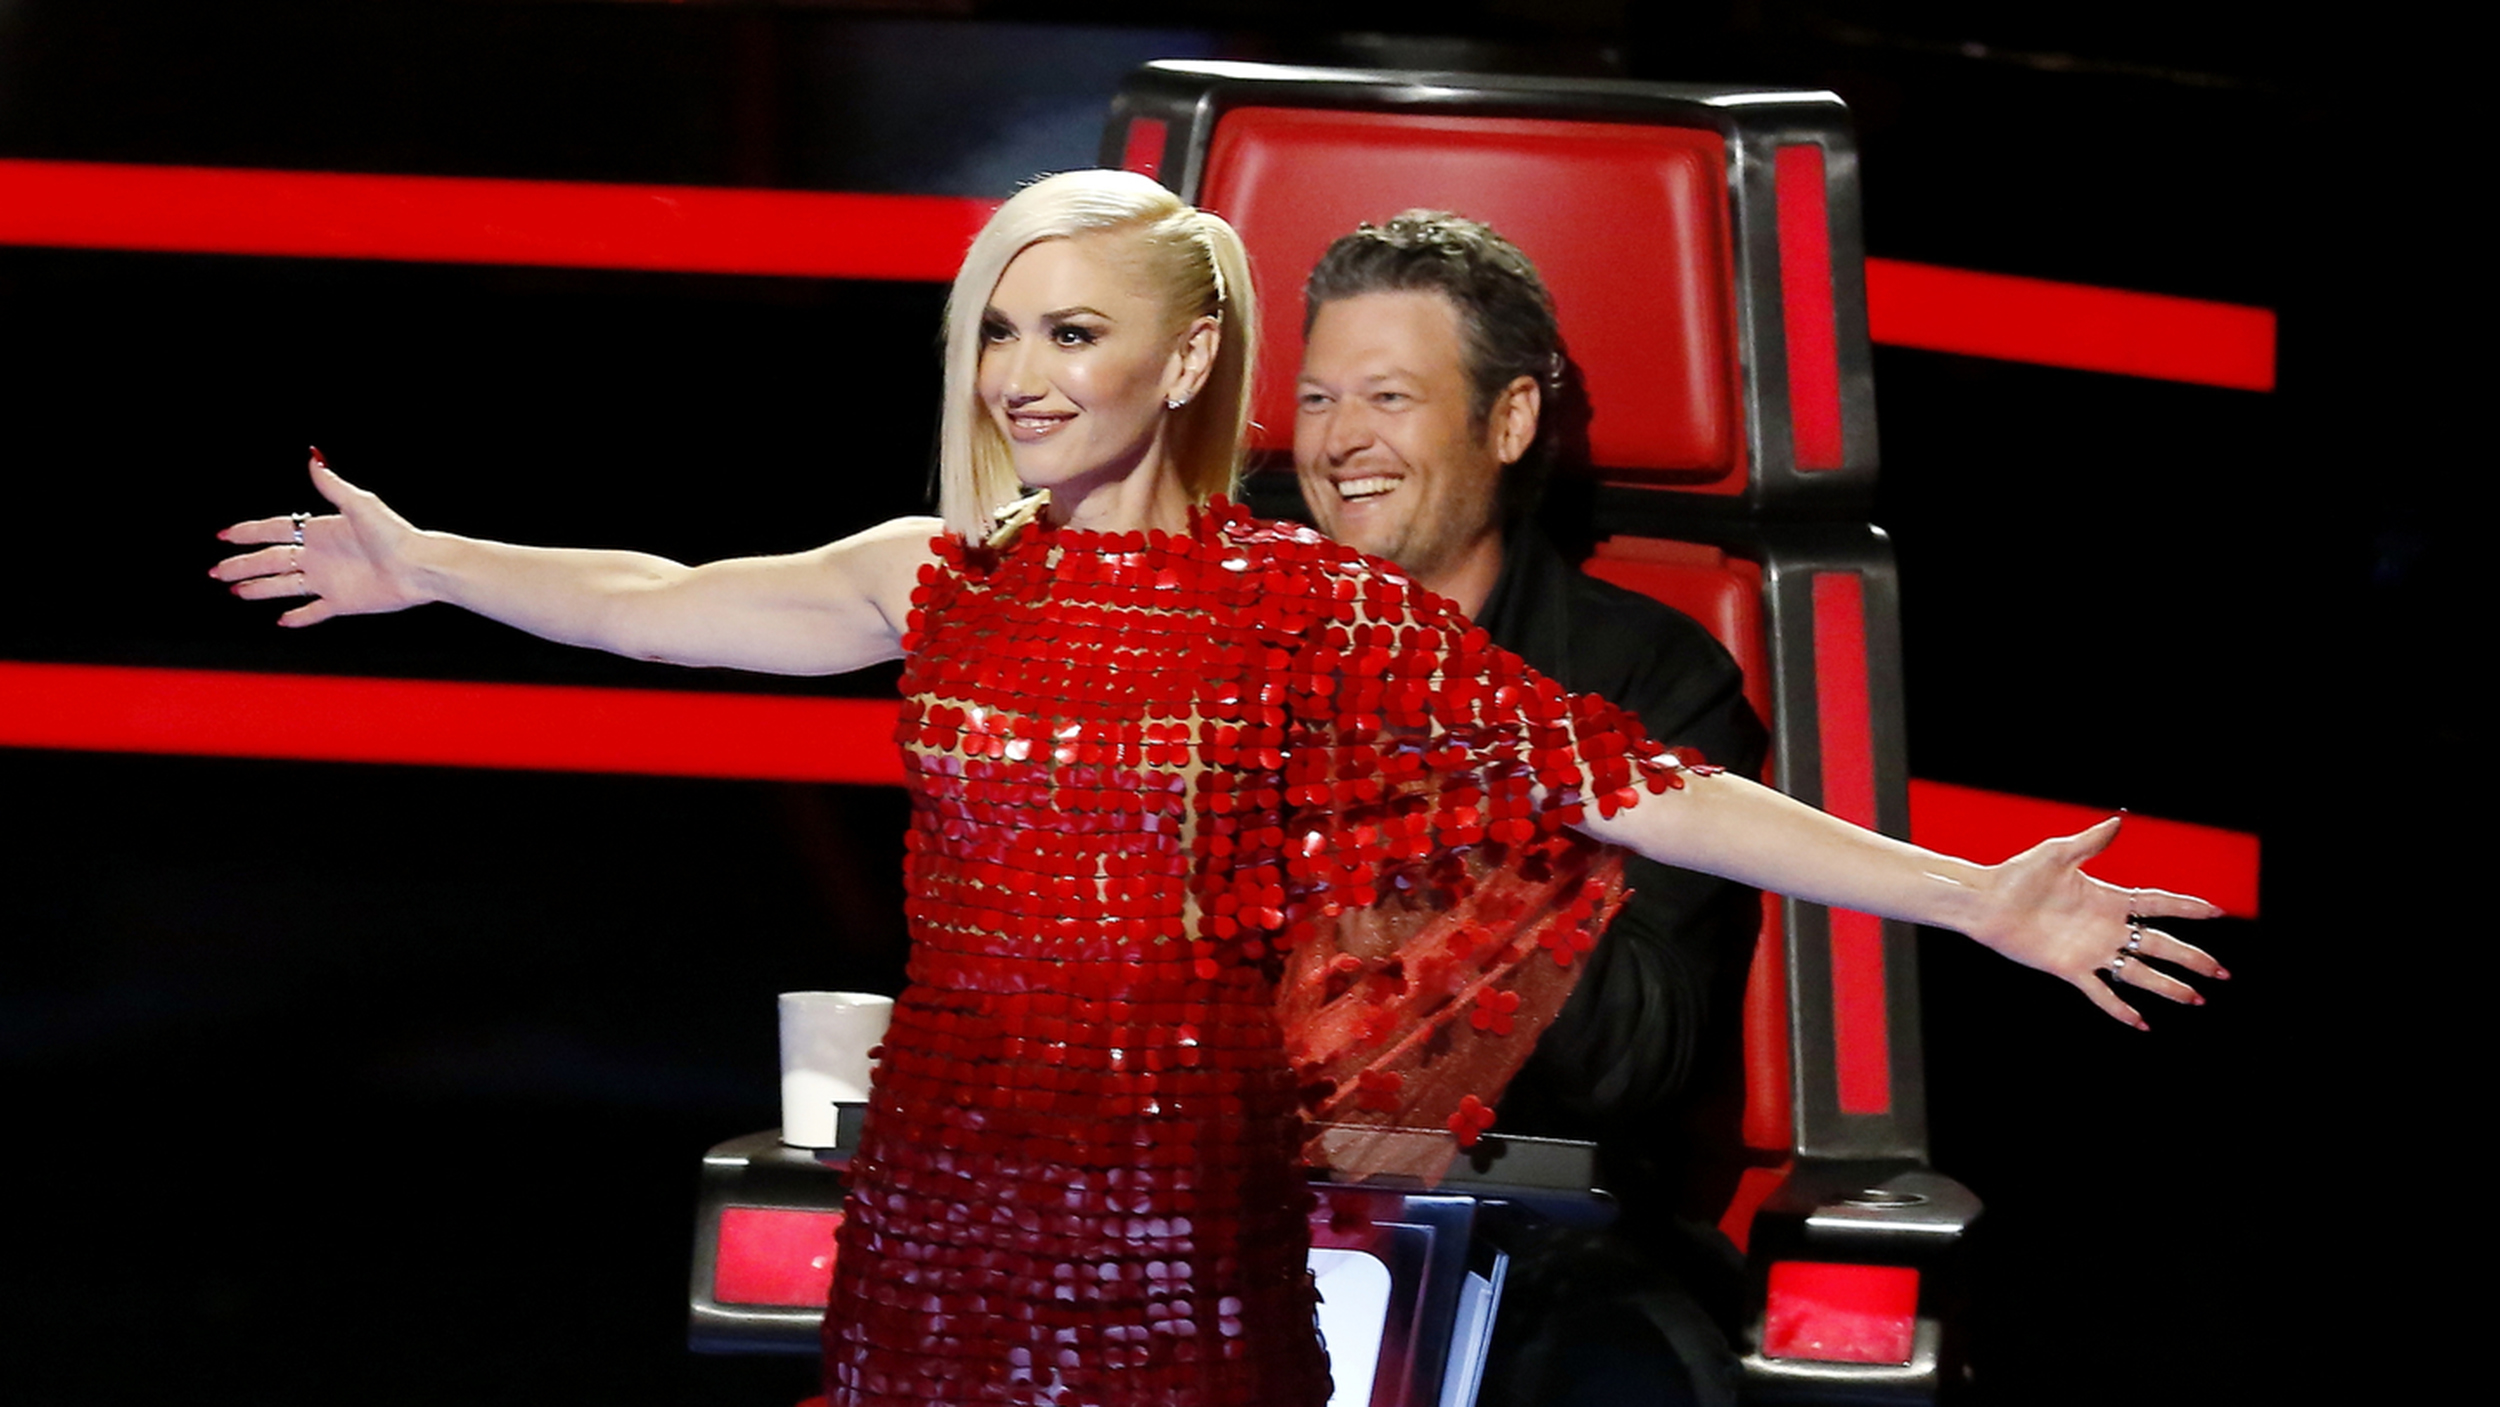 Gwen Stefani Returning To The Voice As Adviser For Blake